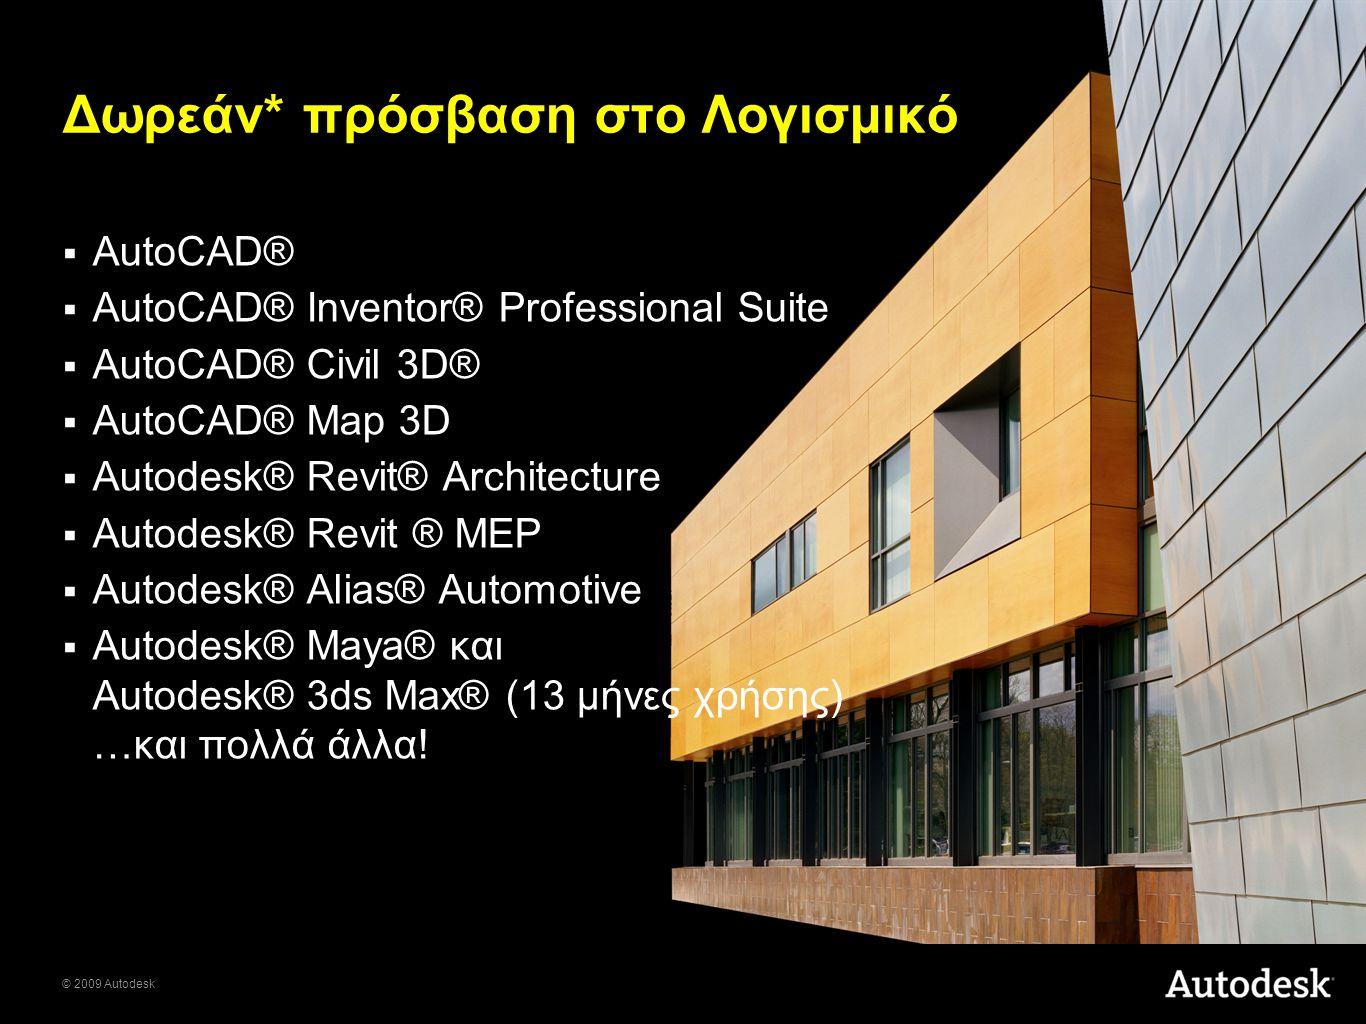 © 2009 Autodesk Δωρεάν* πρόσβαση στο Λογισμικό  AutoCAD®  AutoCAD® Inventor® Professional Suite  AutoCAD® Civil 3D®  AutoCAD® Map 3D  Autodesk® R